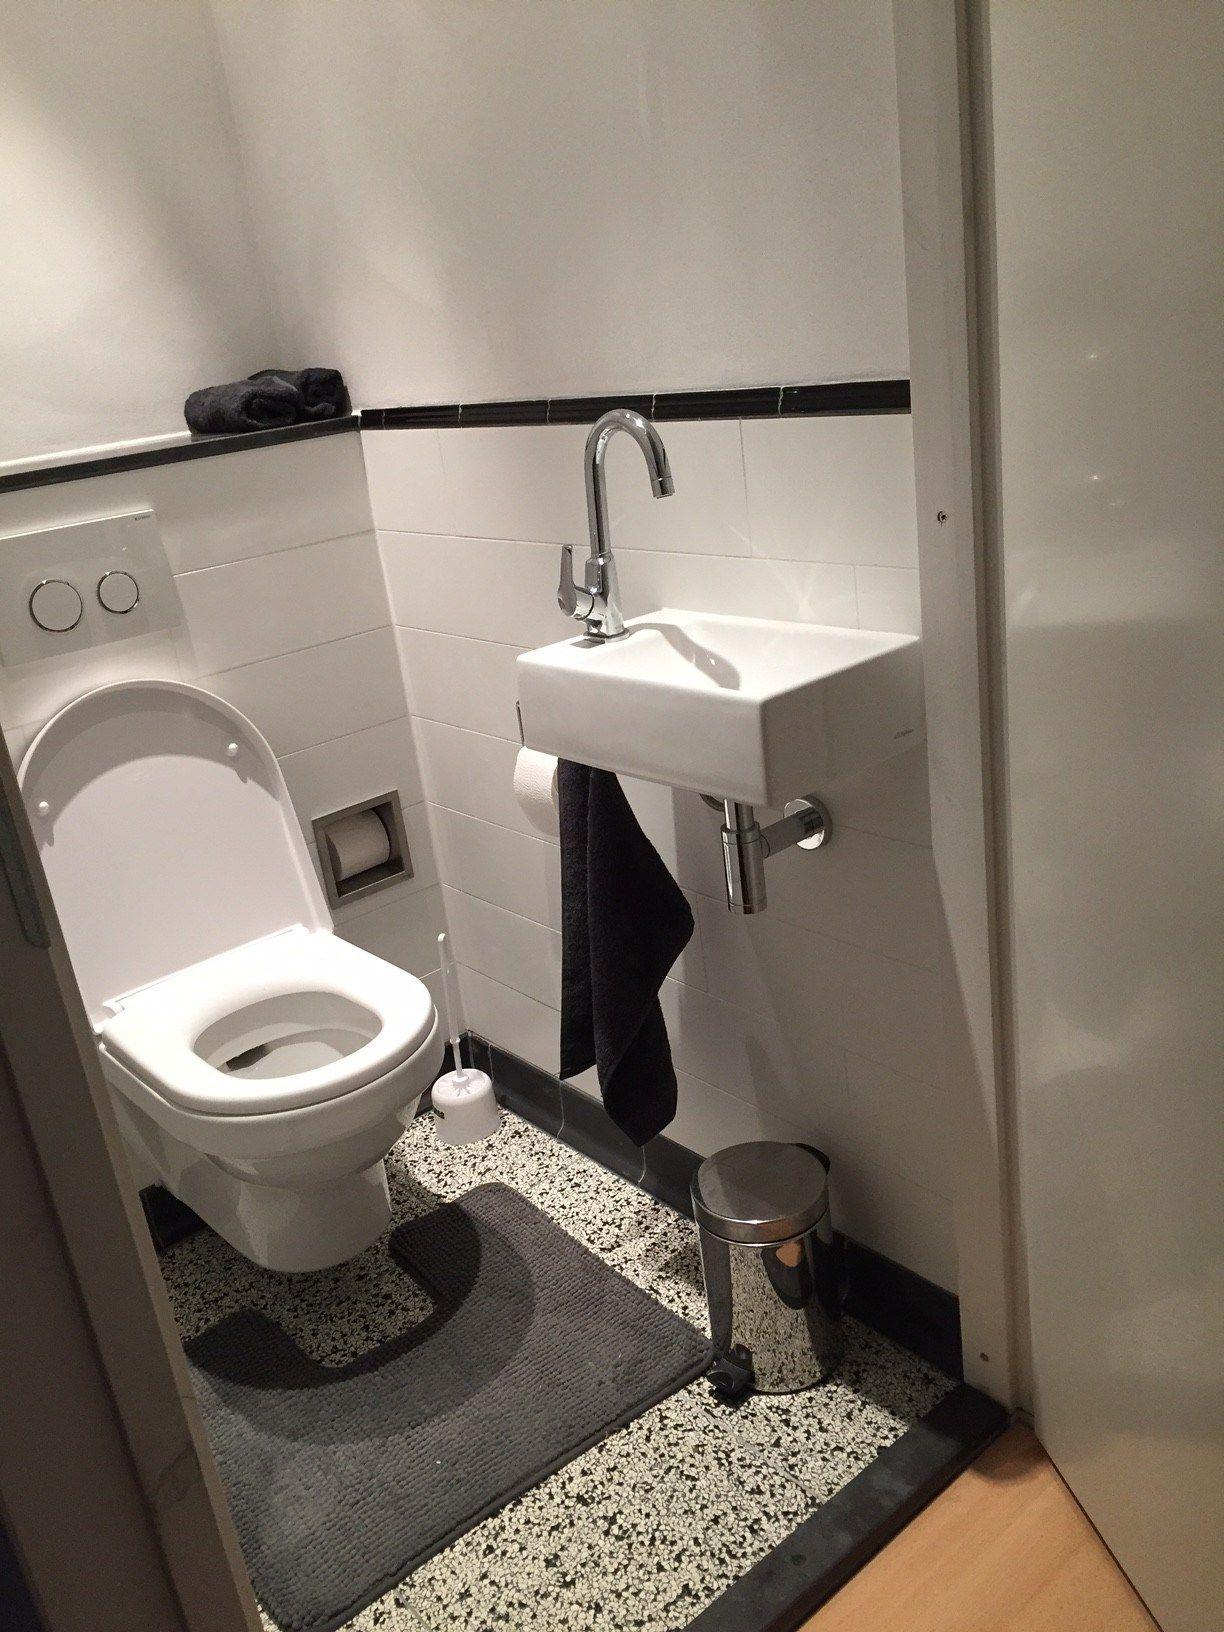 Granito tegels in toilet interieur woning 20 30 jaren stijl pinterest toilet downstairs - Tegels wc design ...